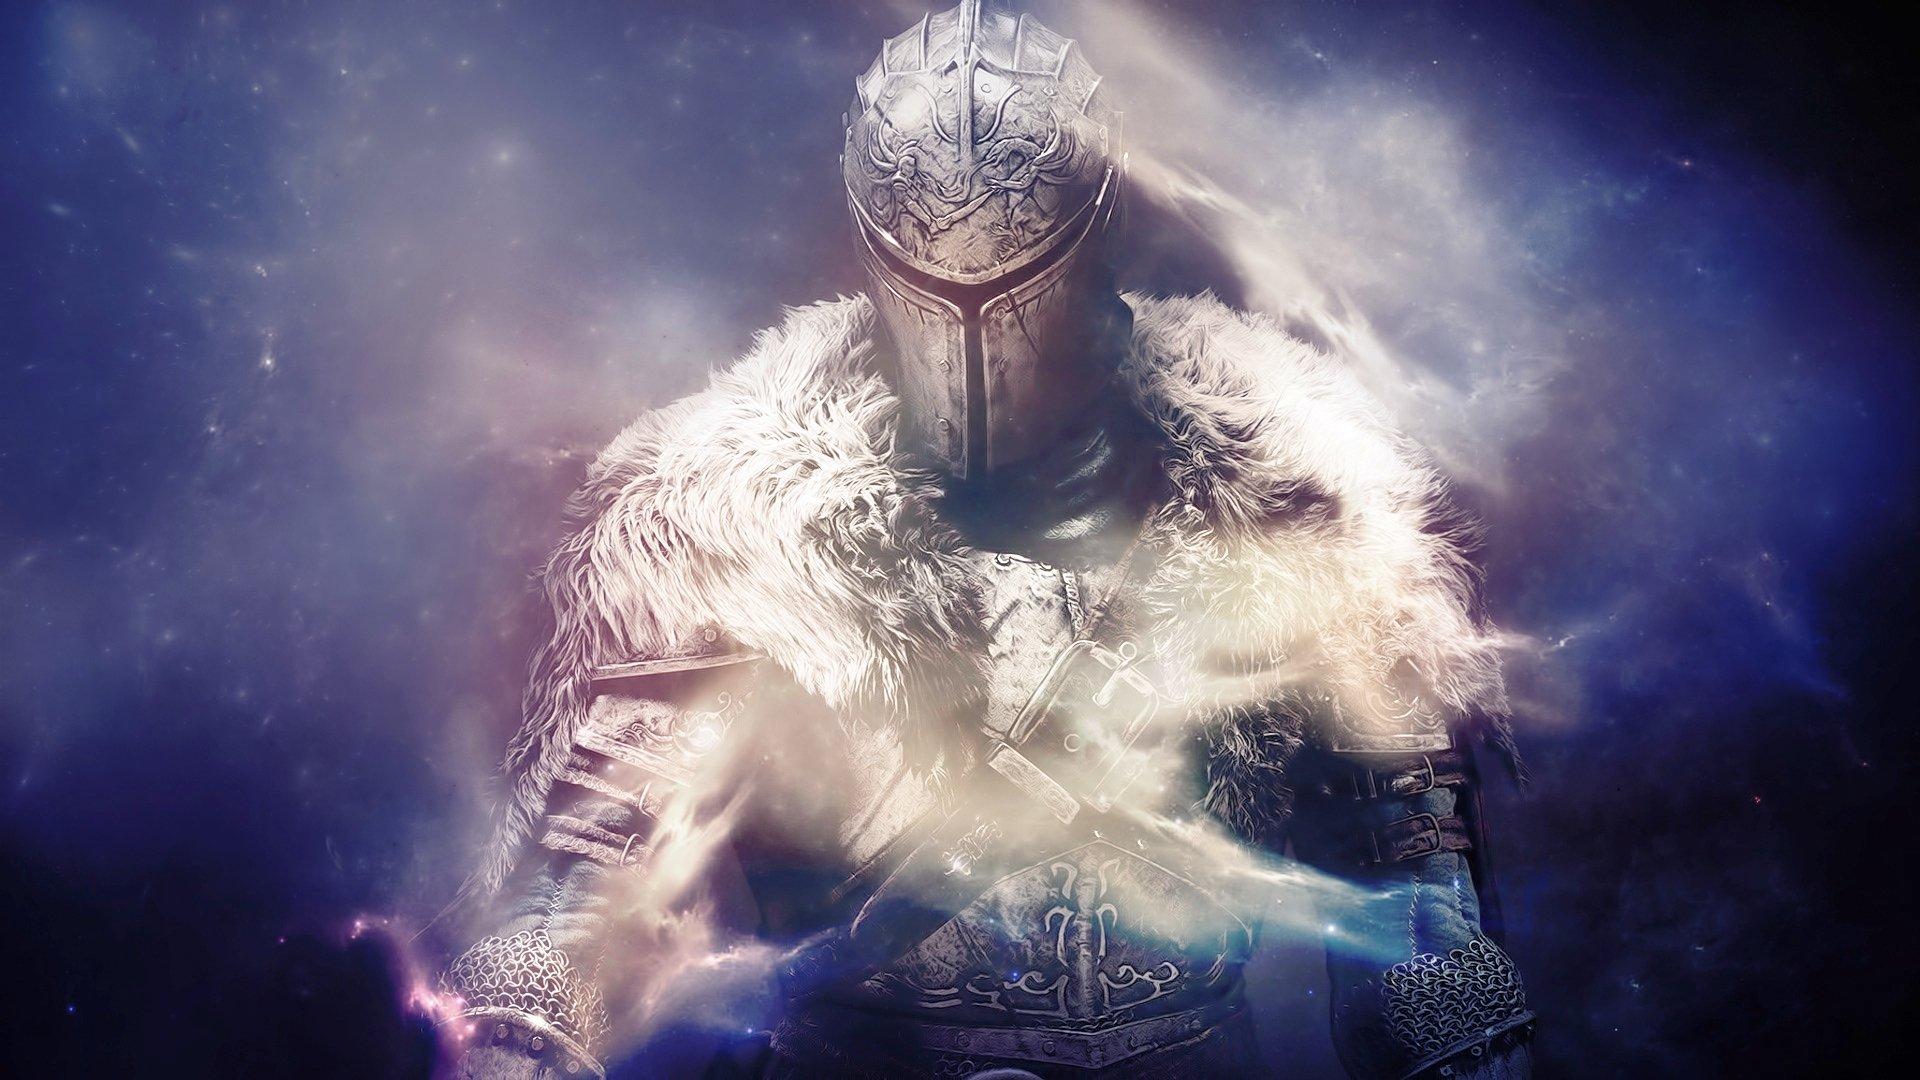 Dark Souls 2 Wallpaper: Dark Souls II Full HD Wallpaper And Background Image